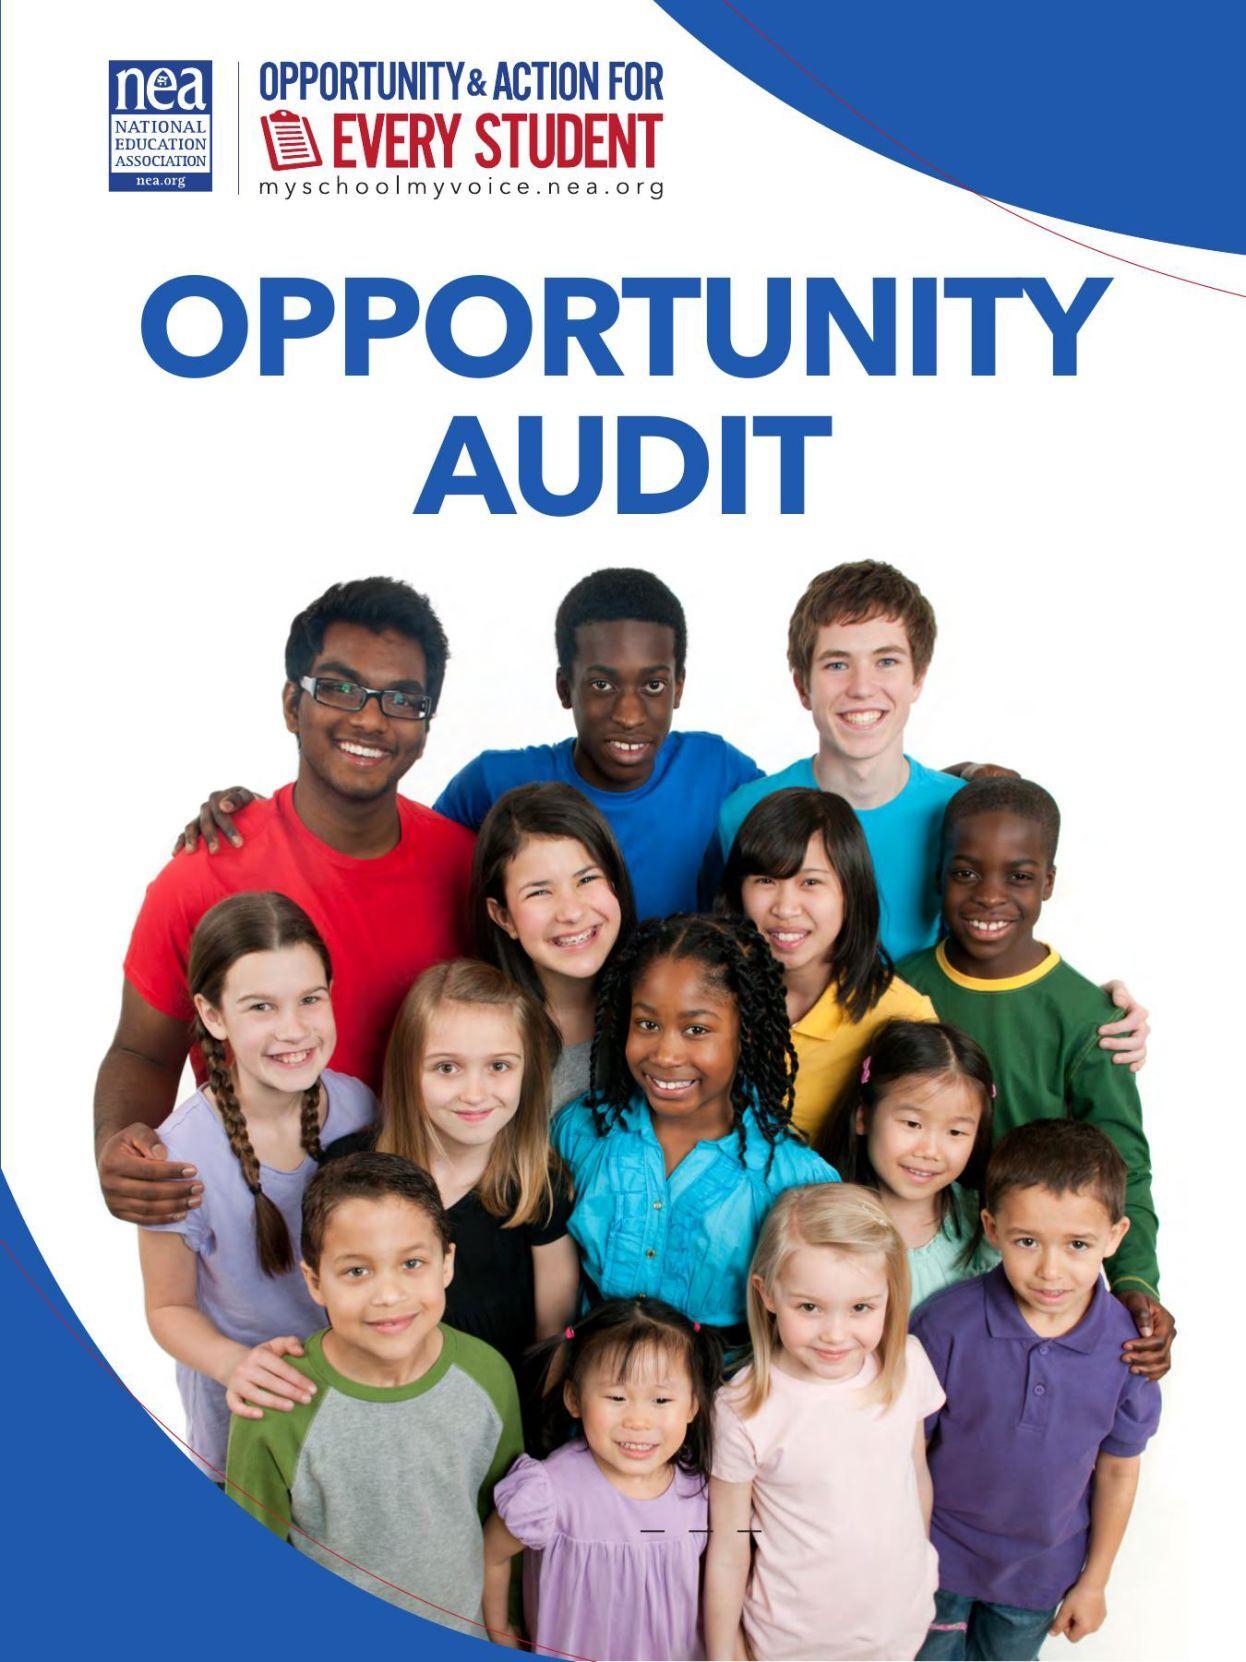 Opportunity Audit